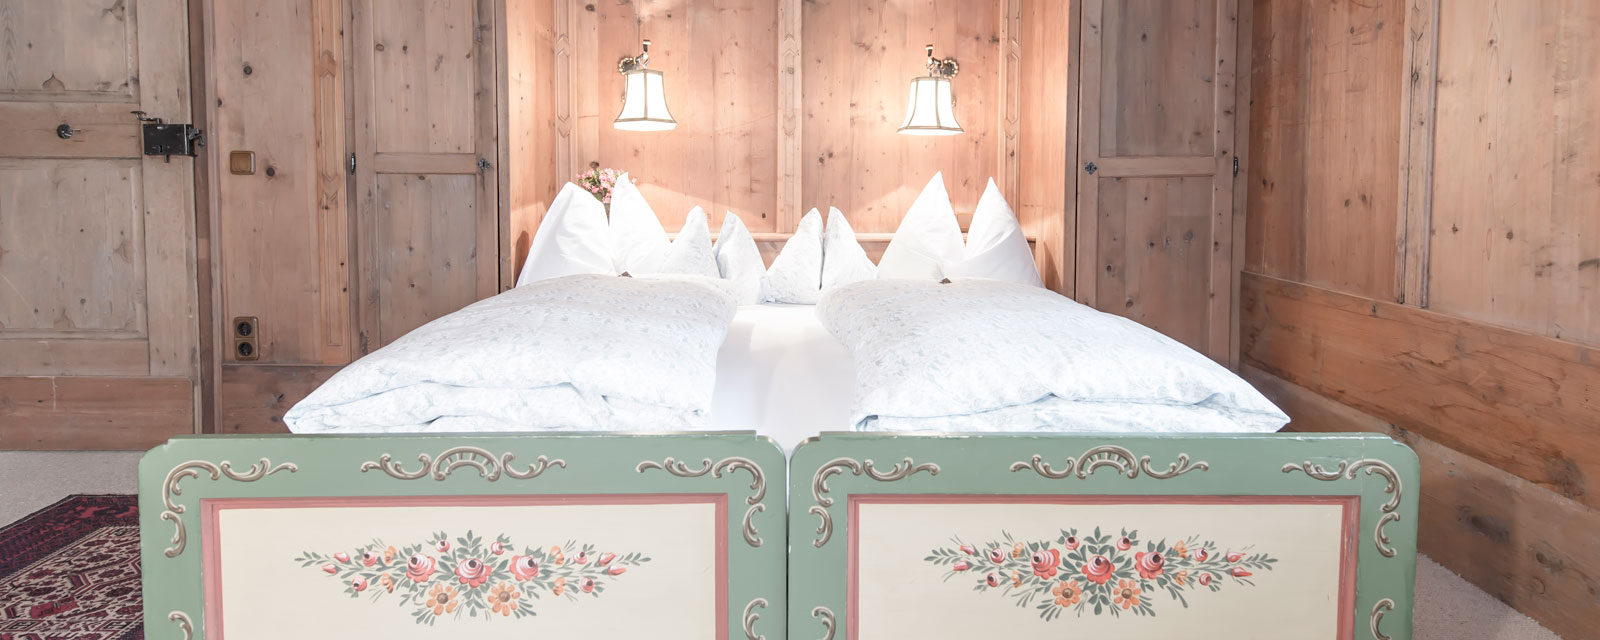 Doppelbett in traditioneller Tiroler Stube